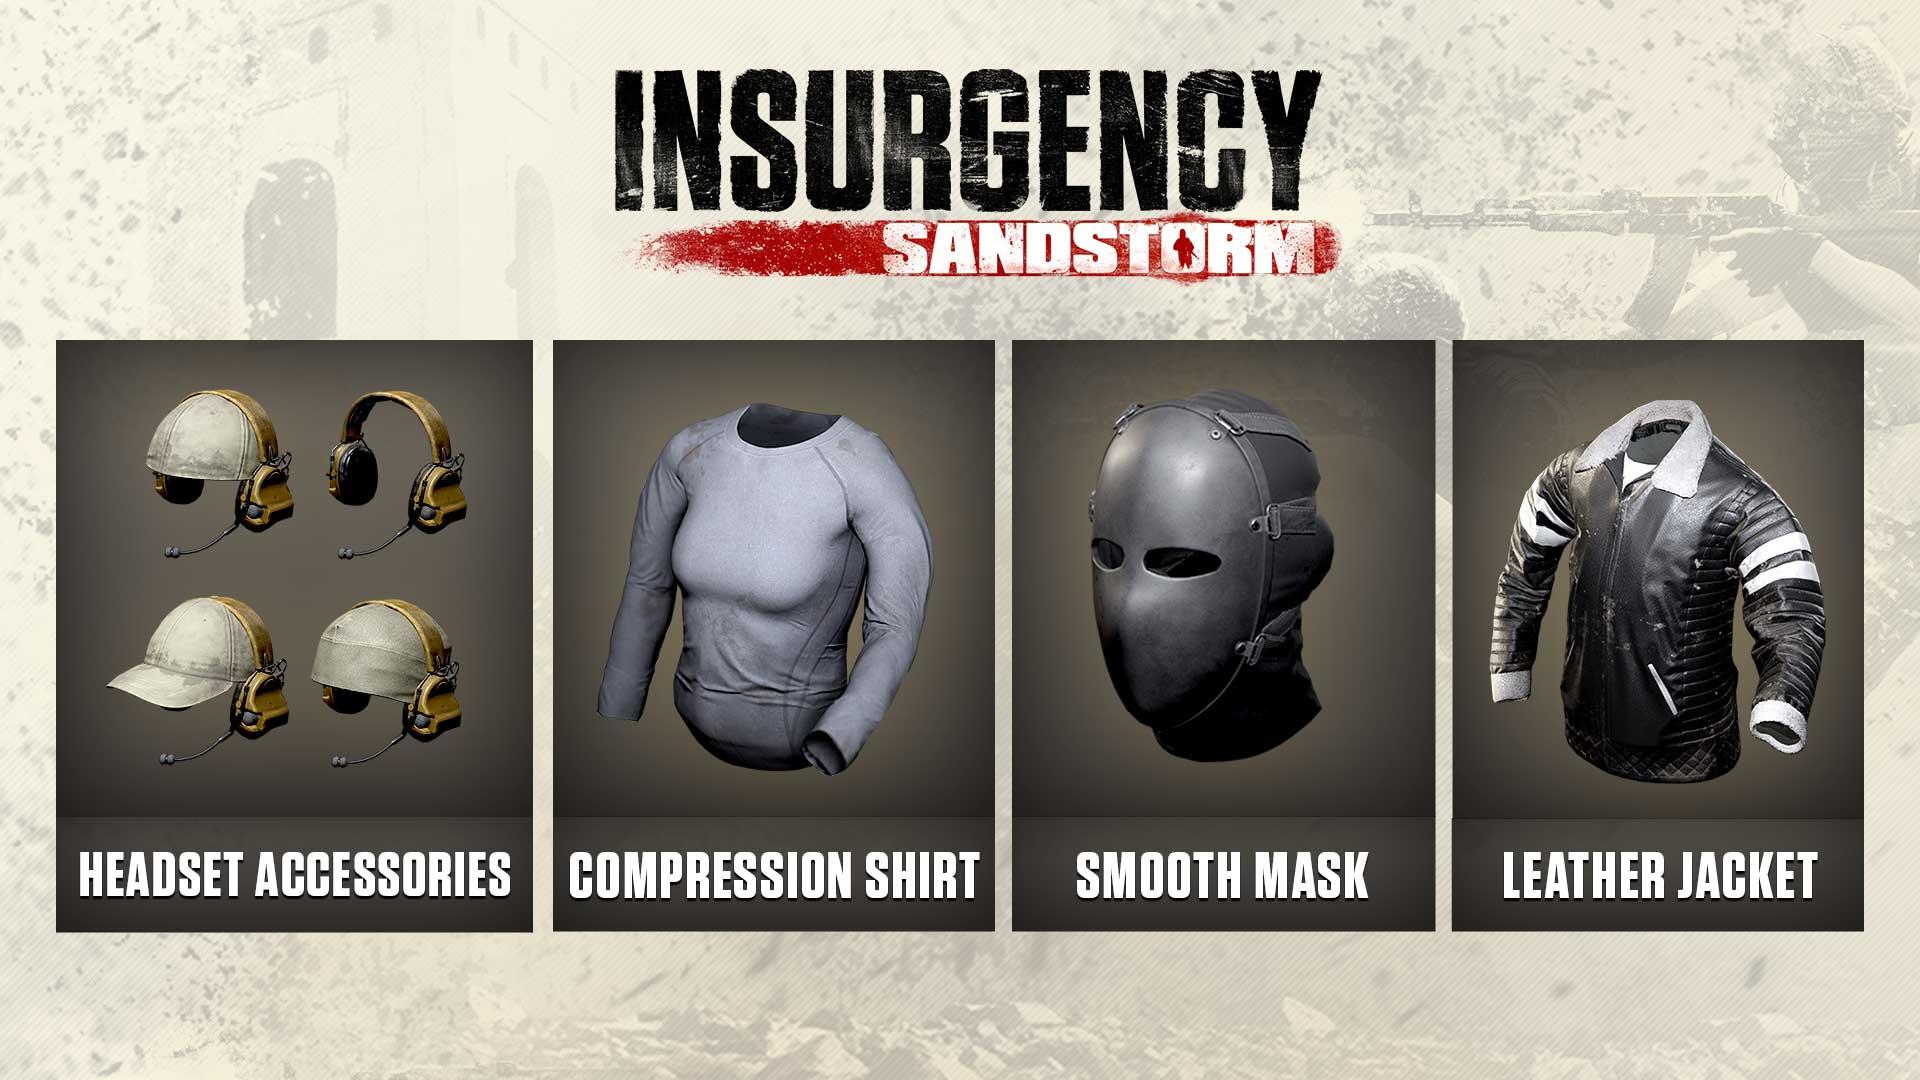 insurgency sandstorm version 1 6 cosmetics